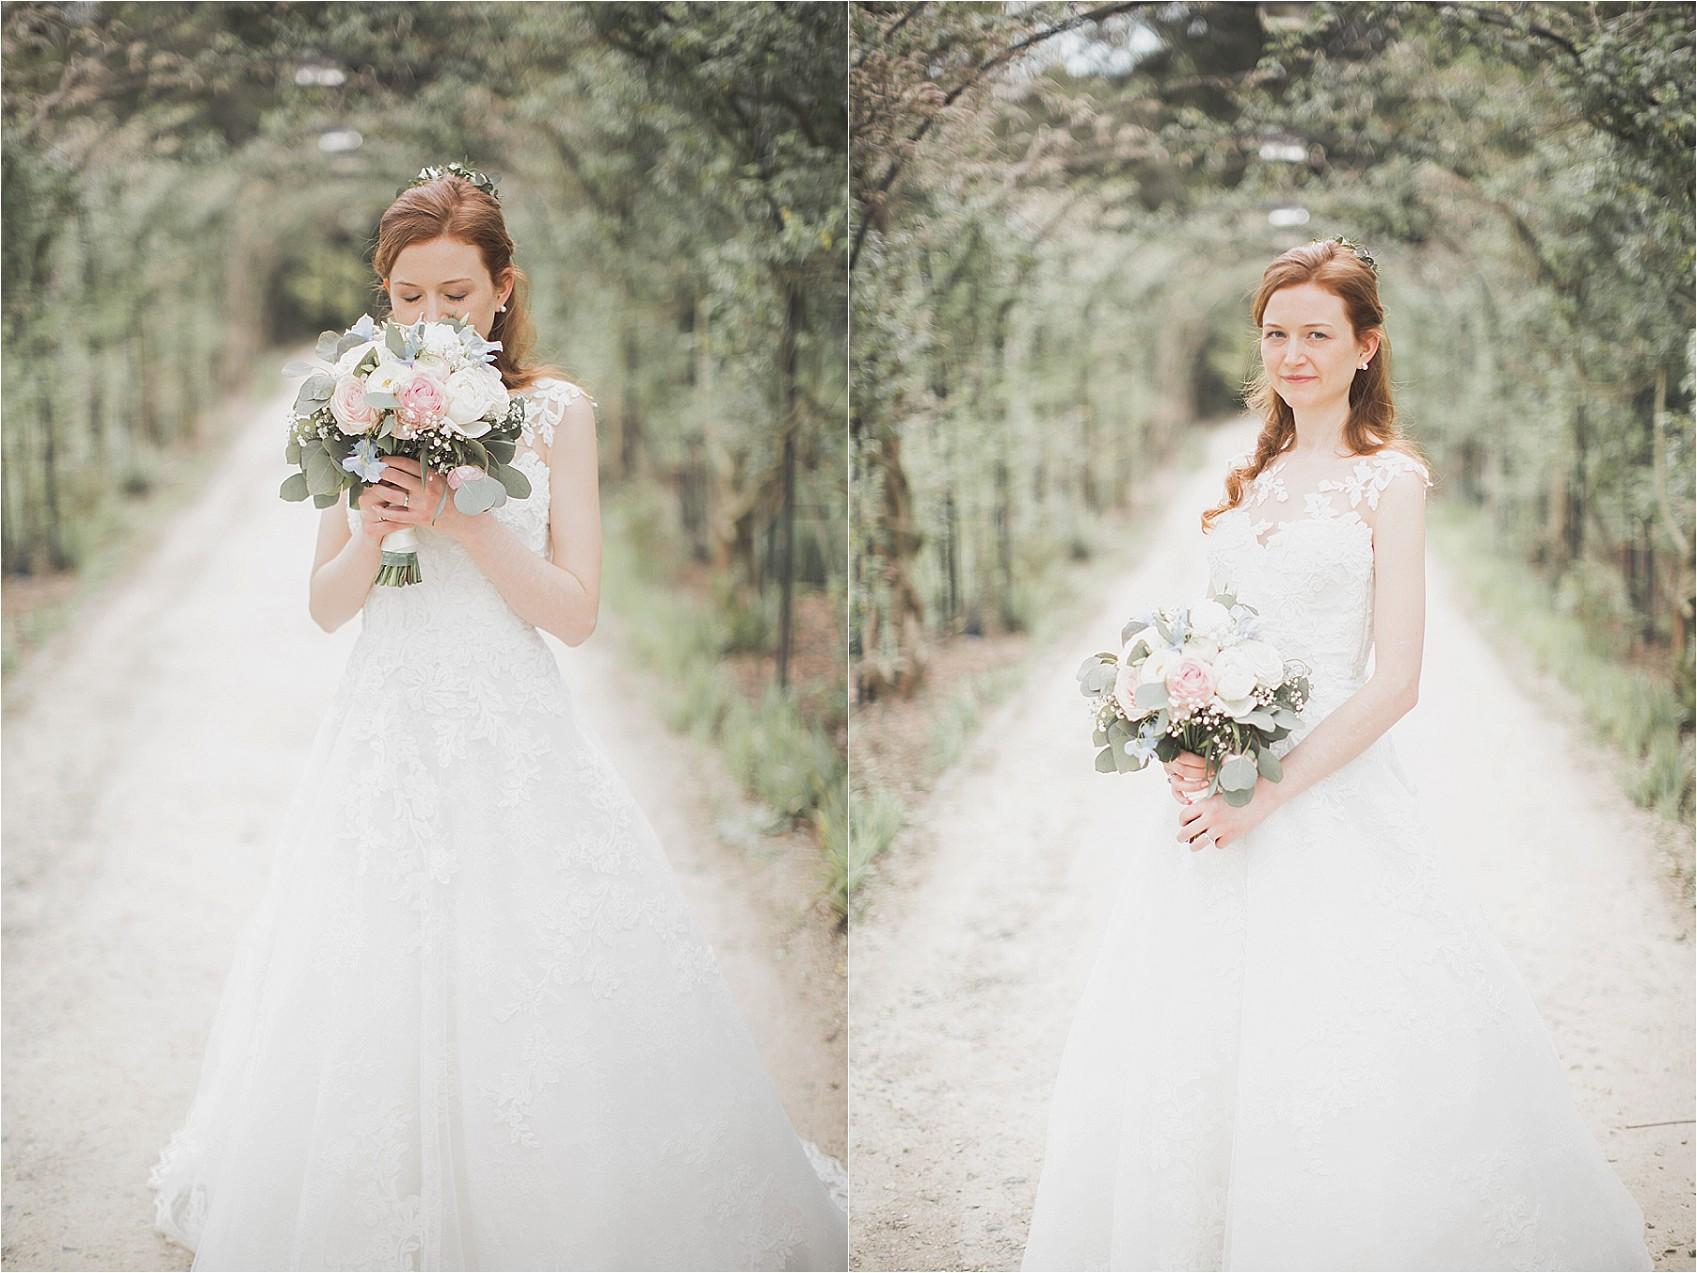 Bride smelling her wedding bouquet